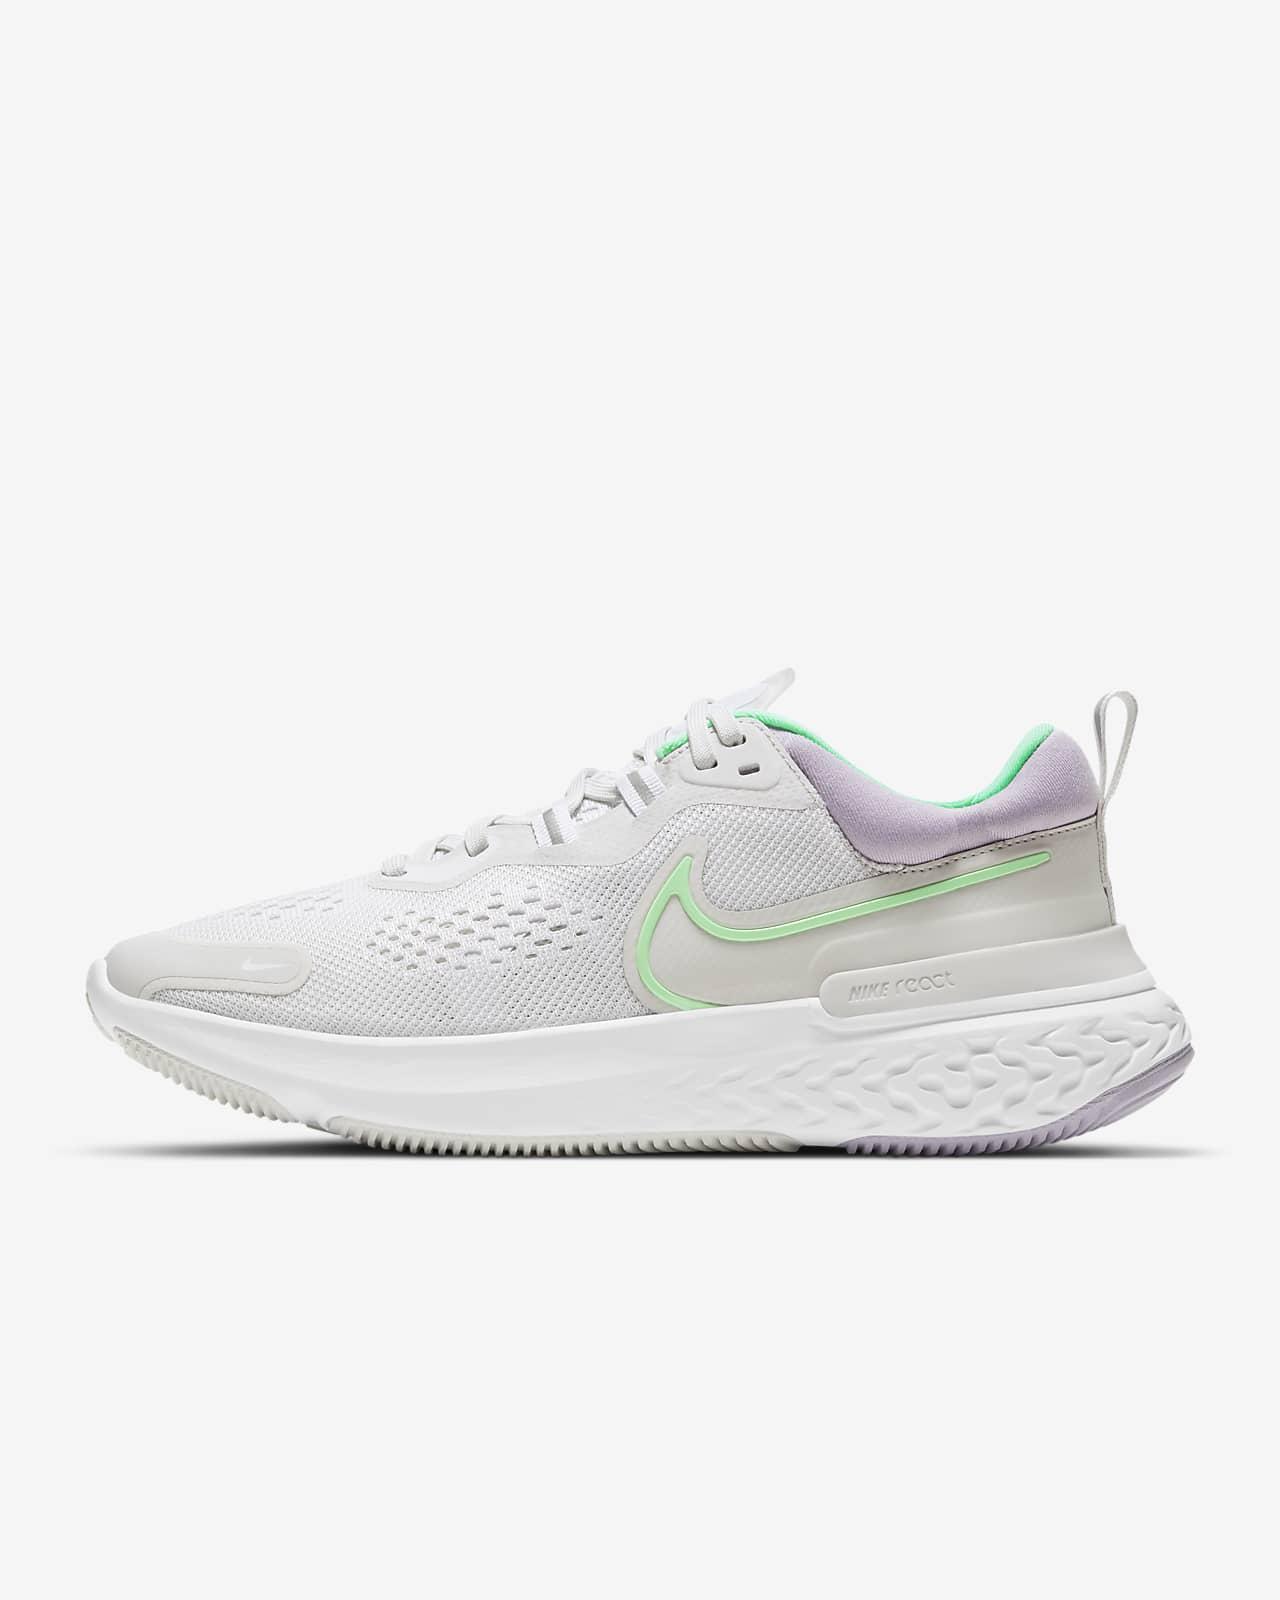 Calzado de running para mujer Nike React Miler 2